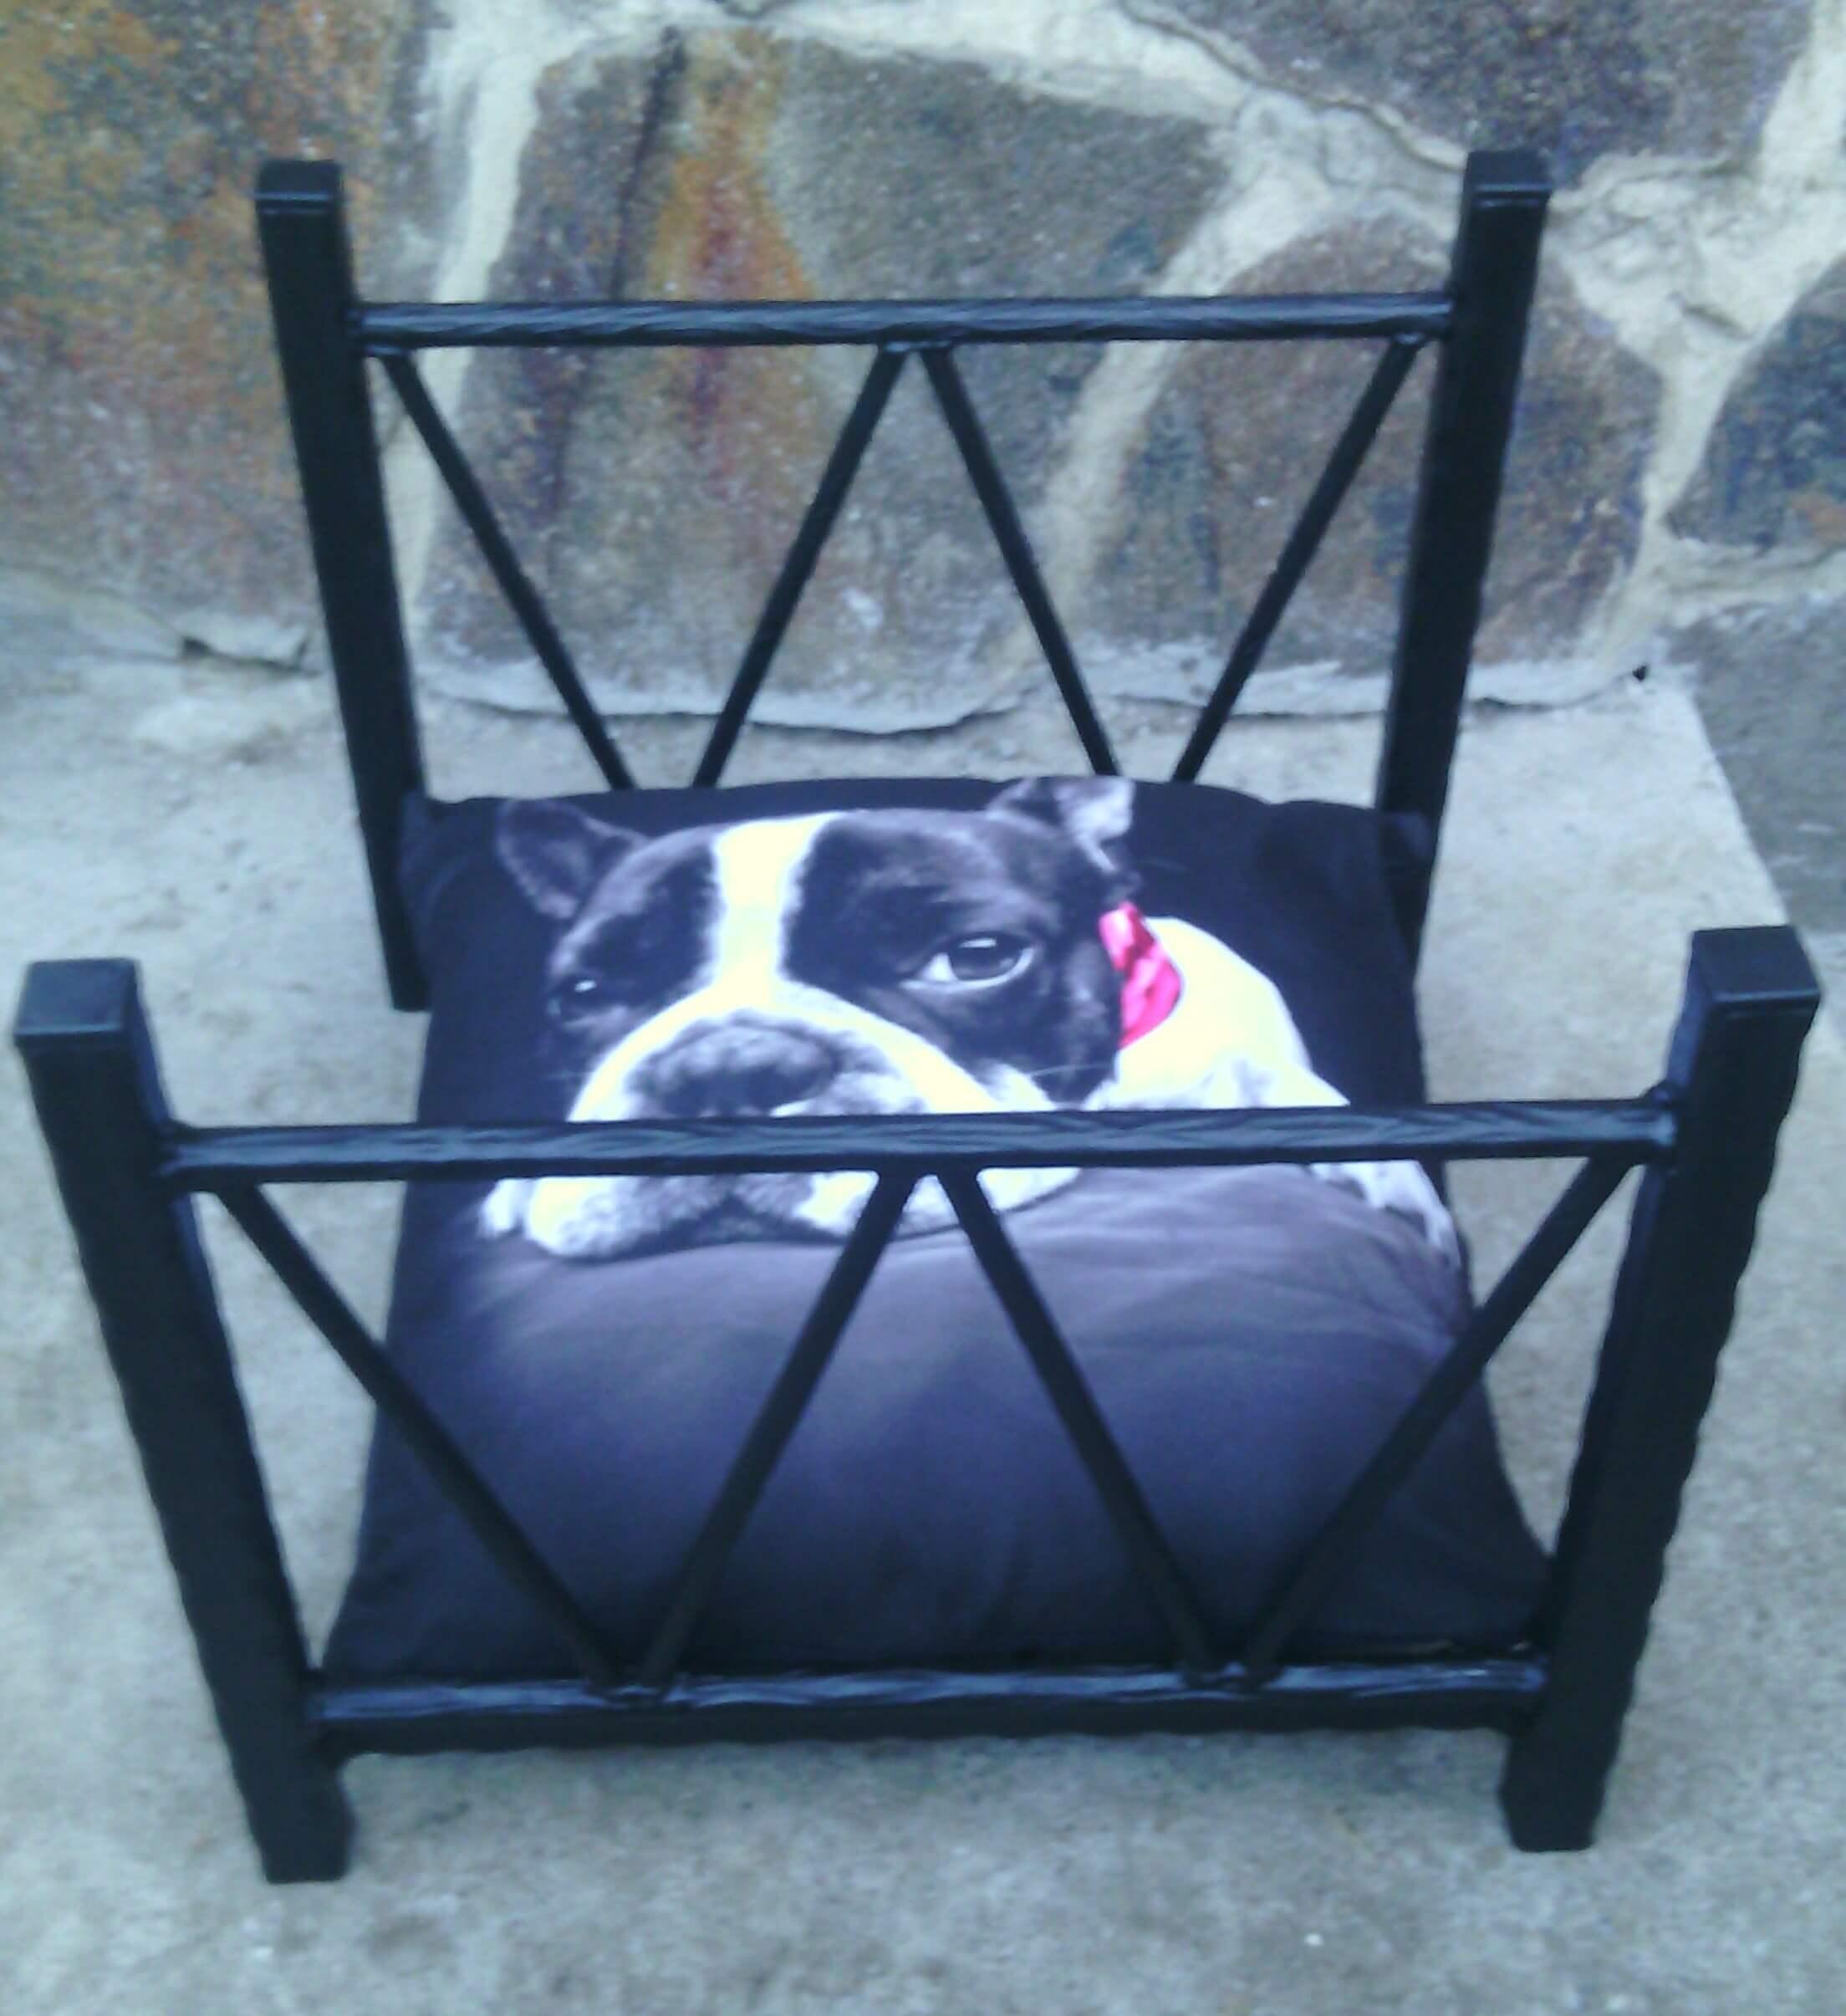 Kovová posteľ pre psa, Kovová postel pro psa, Metal dog bed, Hundebett aus Metall